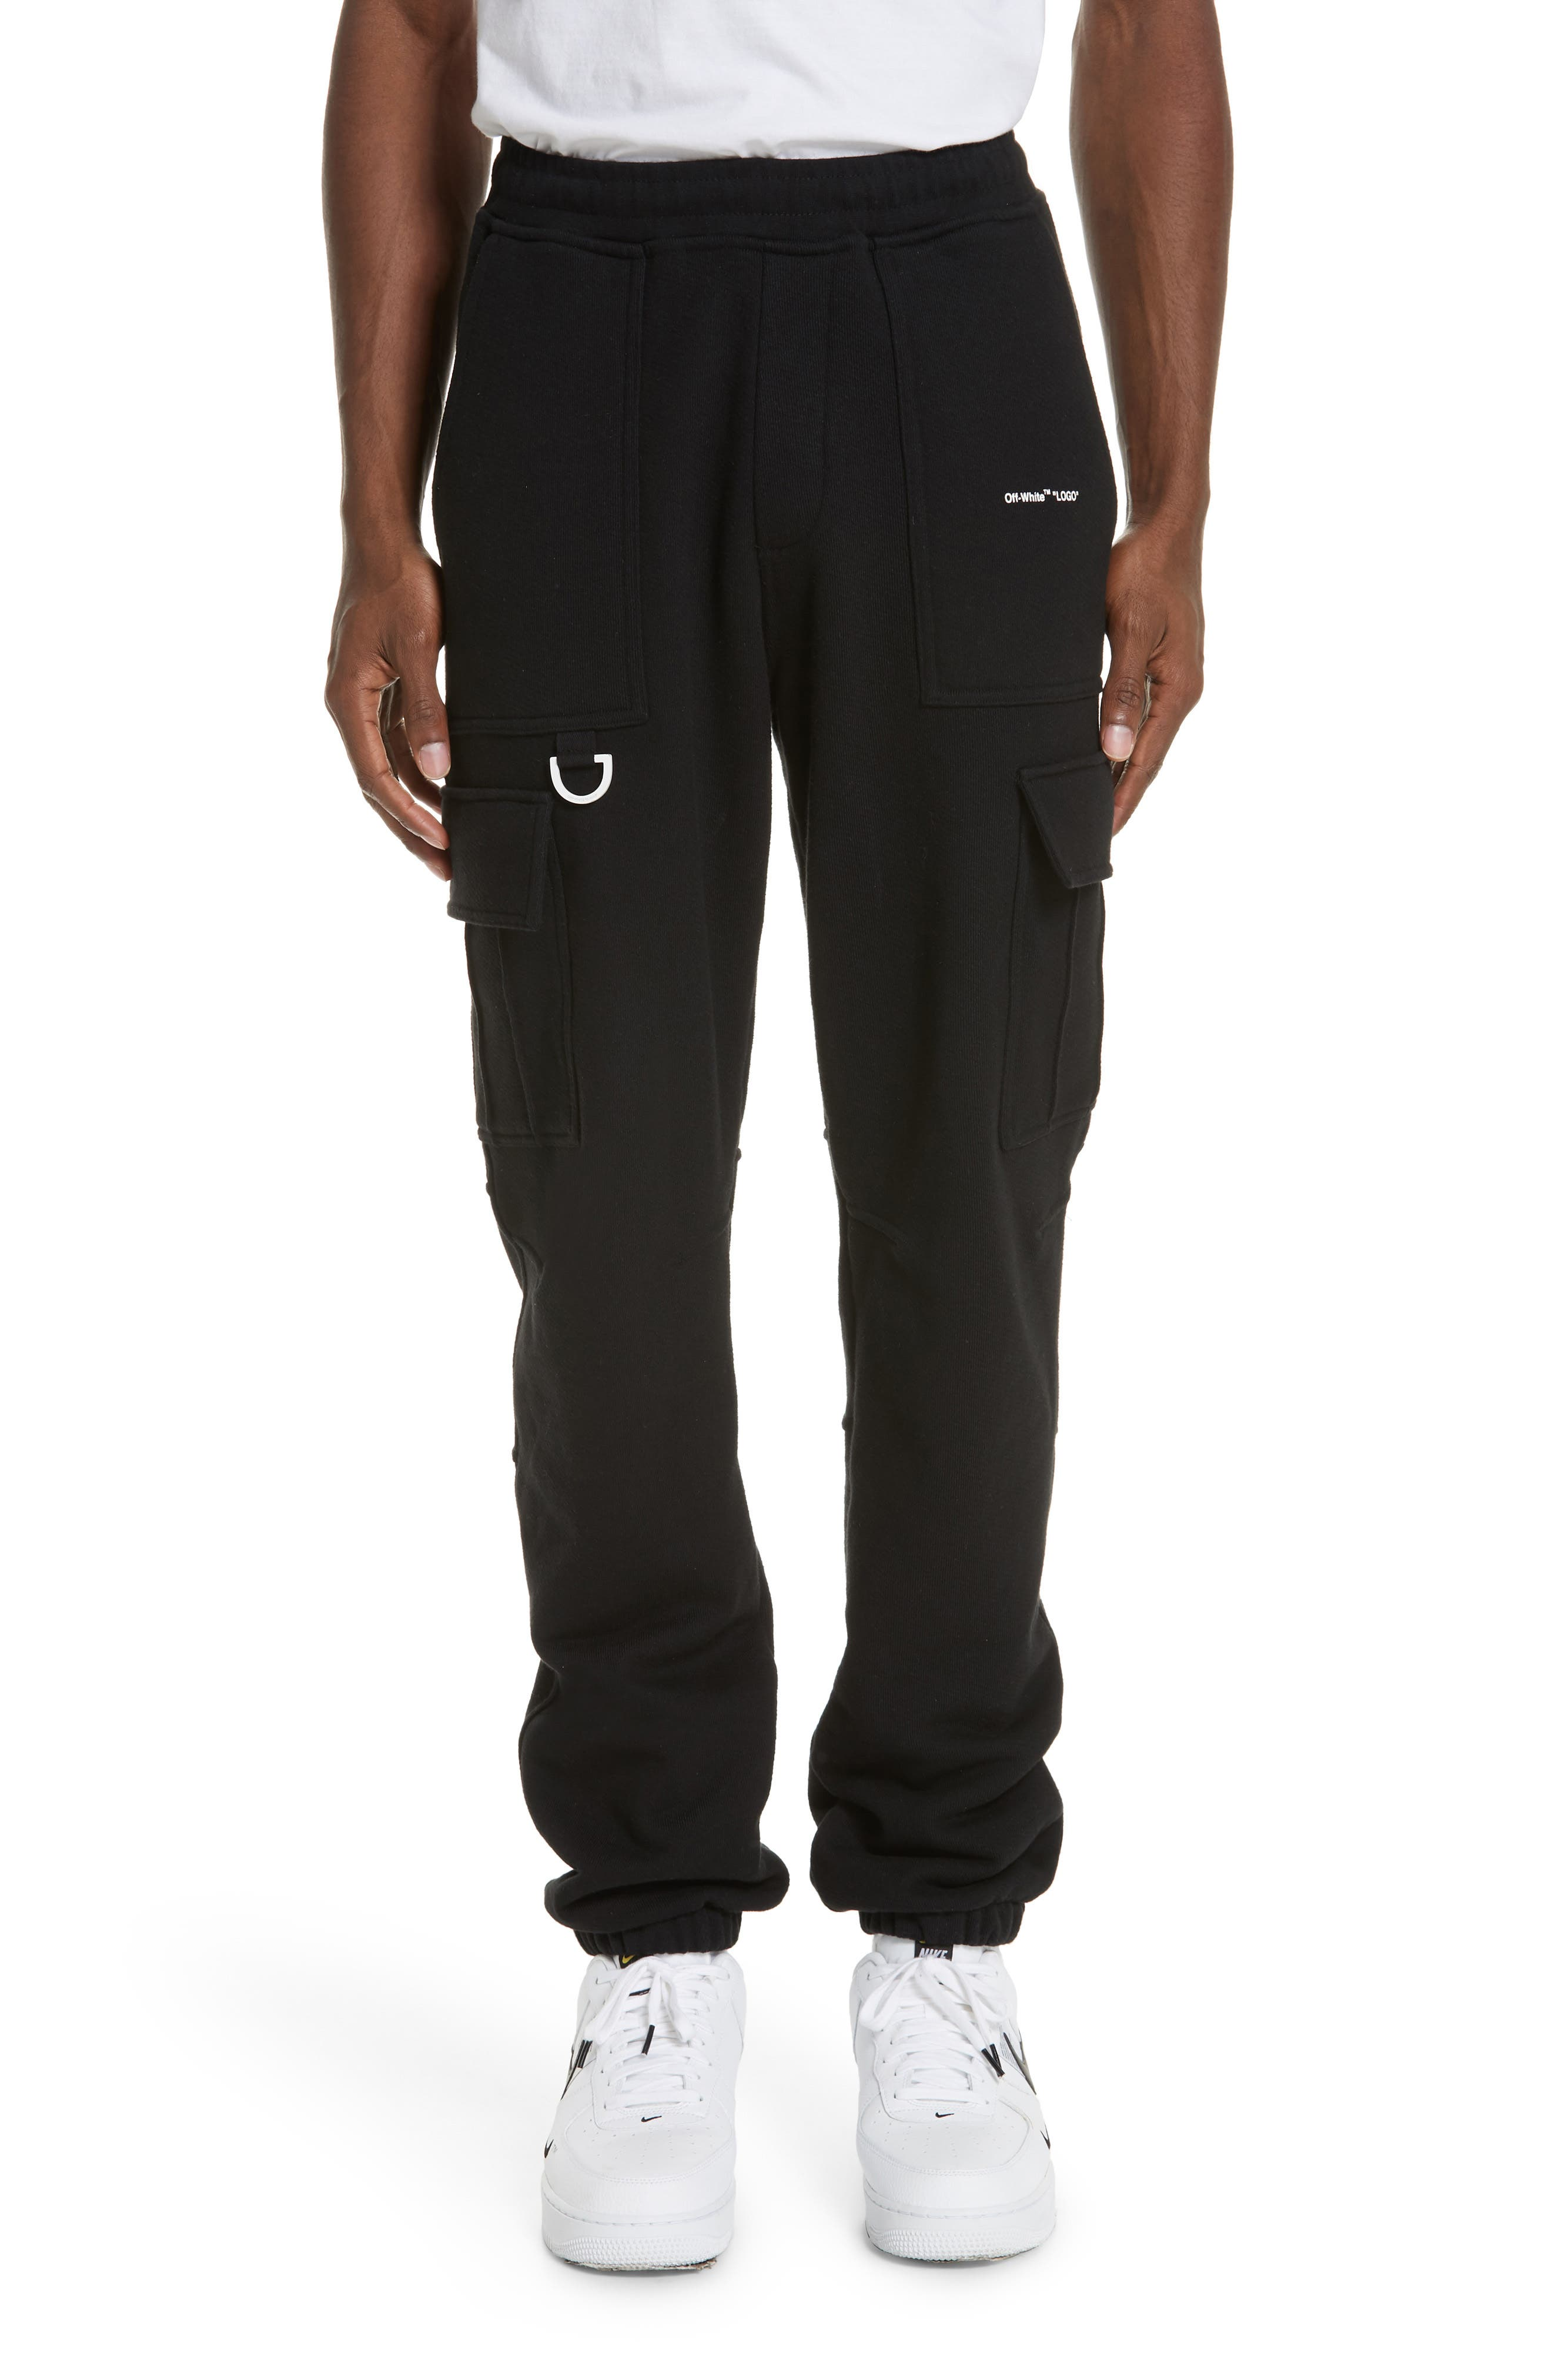 OFF-WHITE Cargo Jogger Pants, Main, color, BLACK